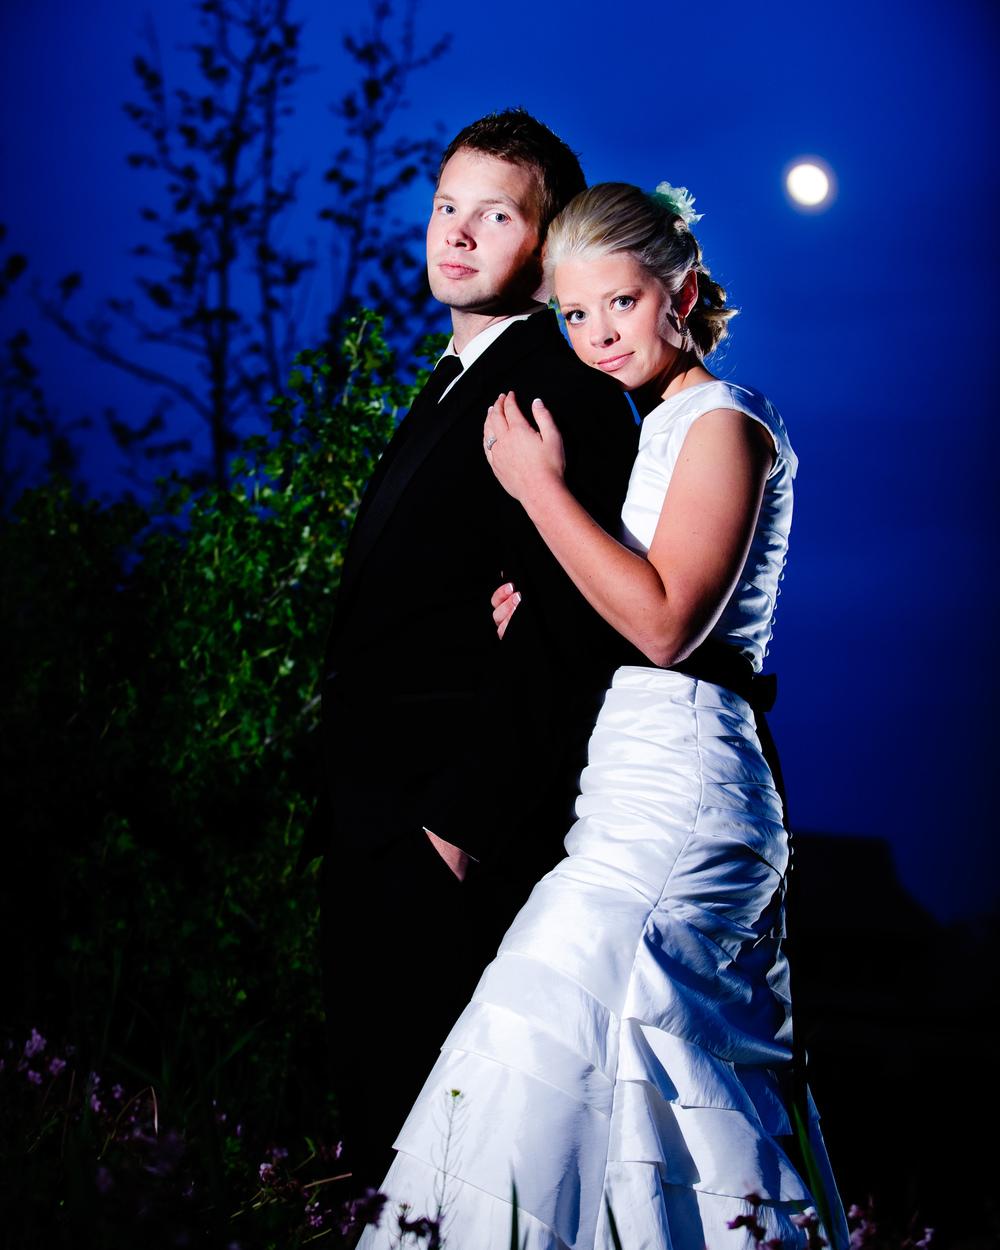 007-Abbey&TaylorBridals-21.jpg